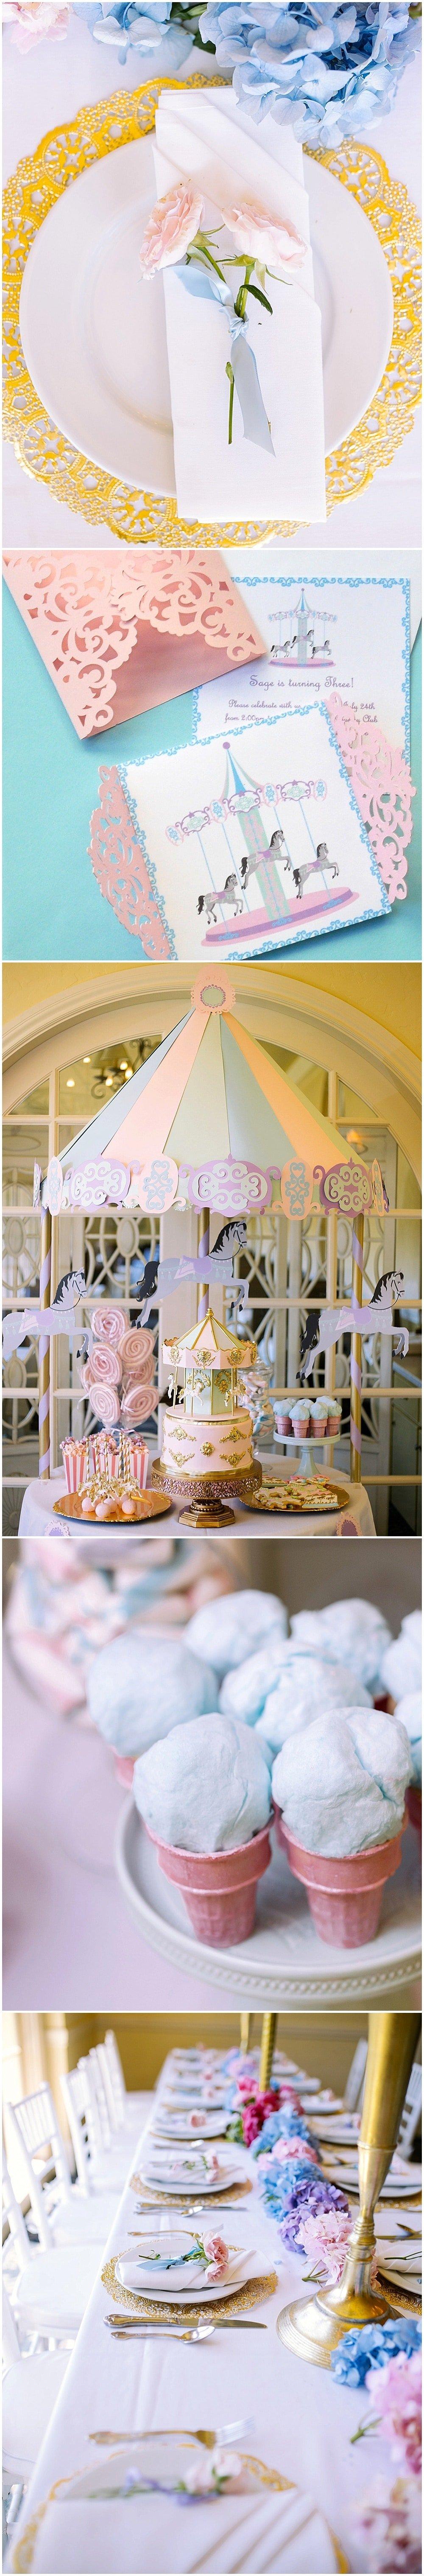 Gorgeous Magical Carousel Birthday Party!